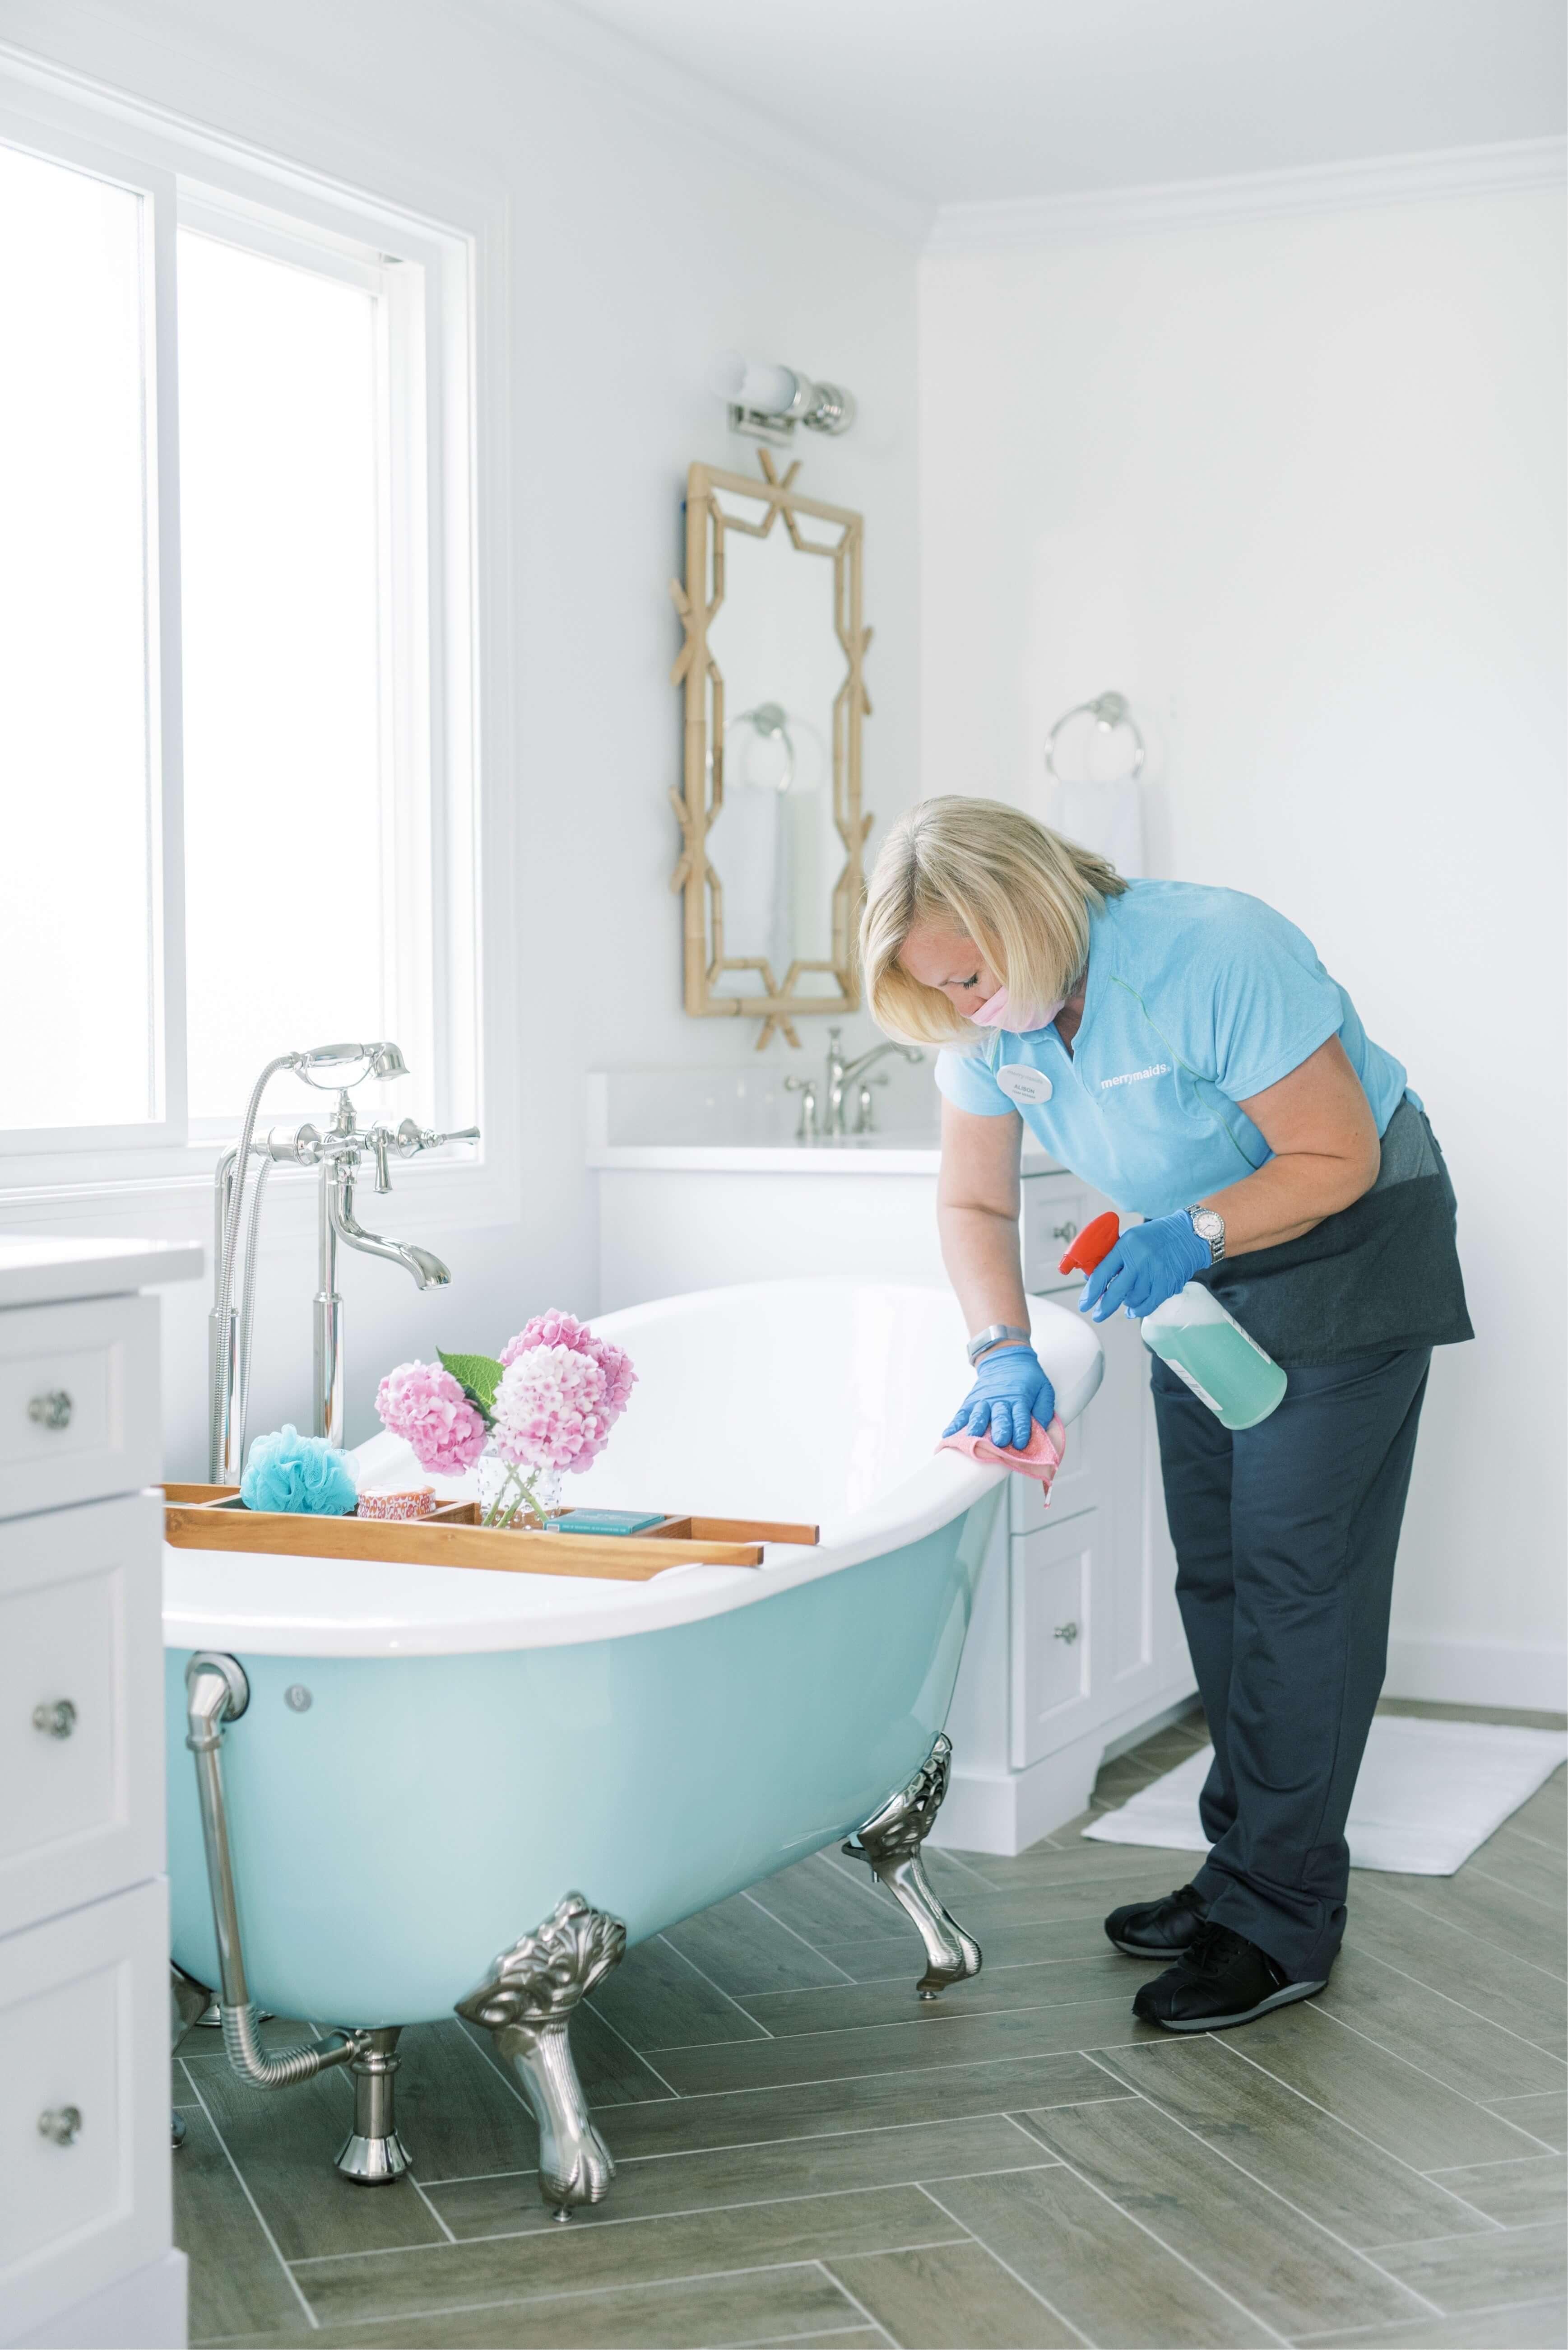 Merry Maids team member cleaning bathtub